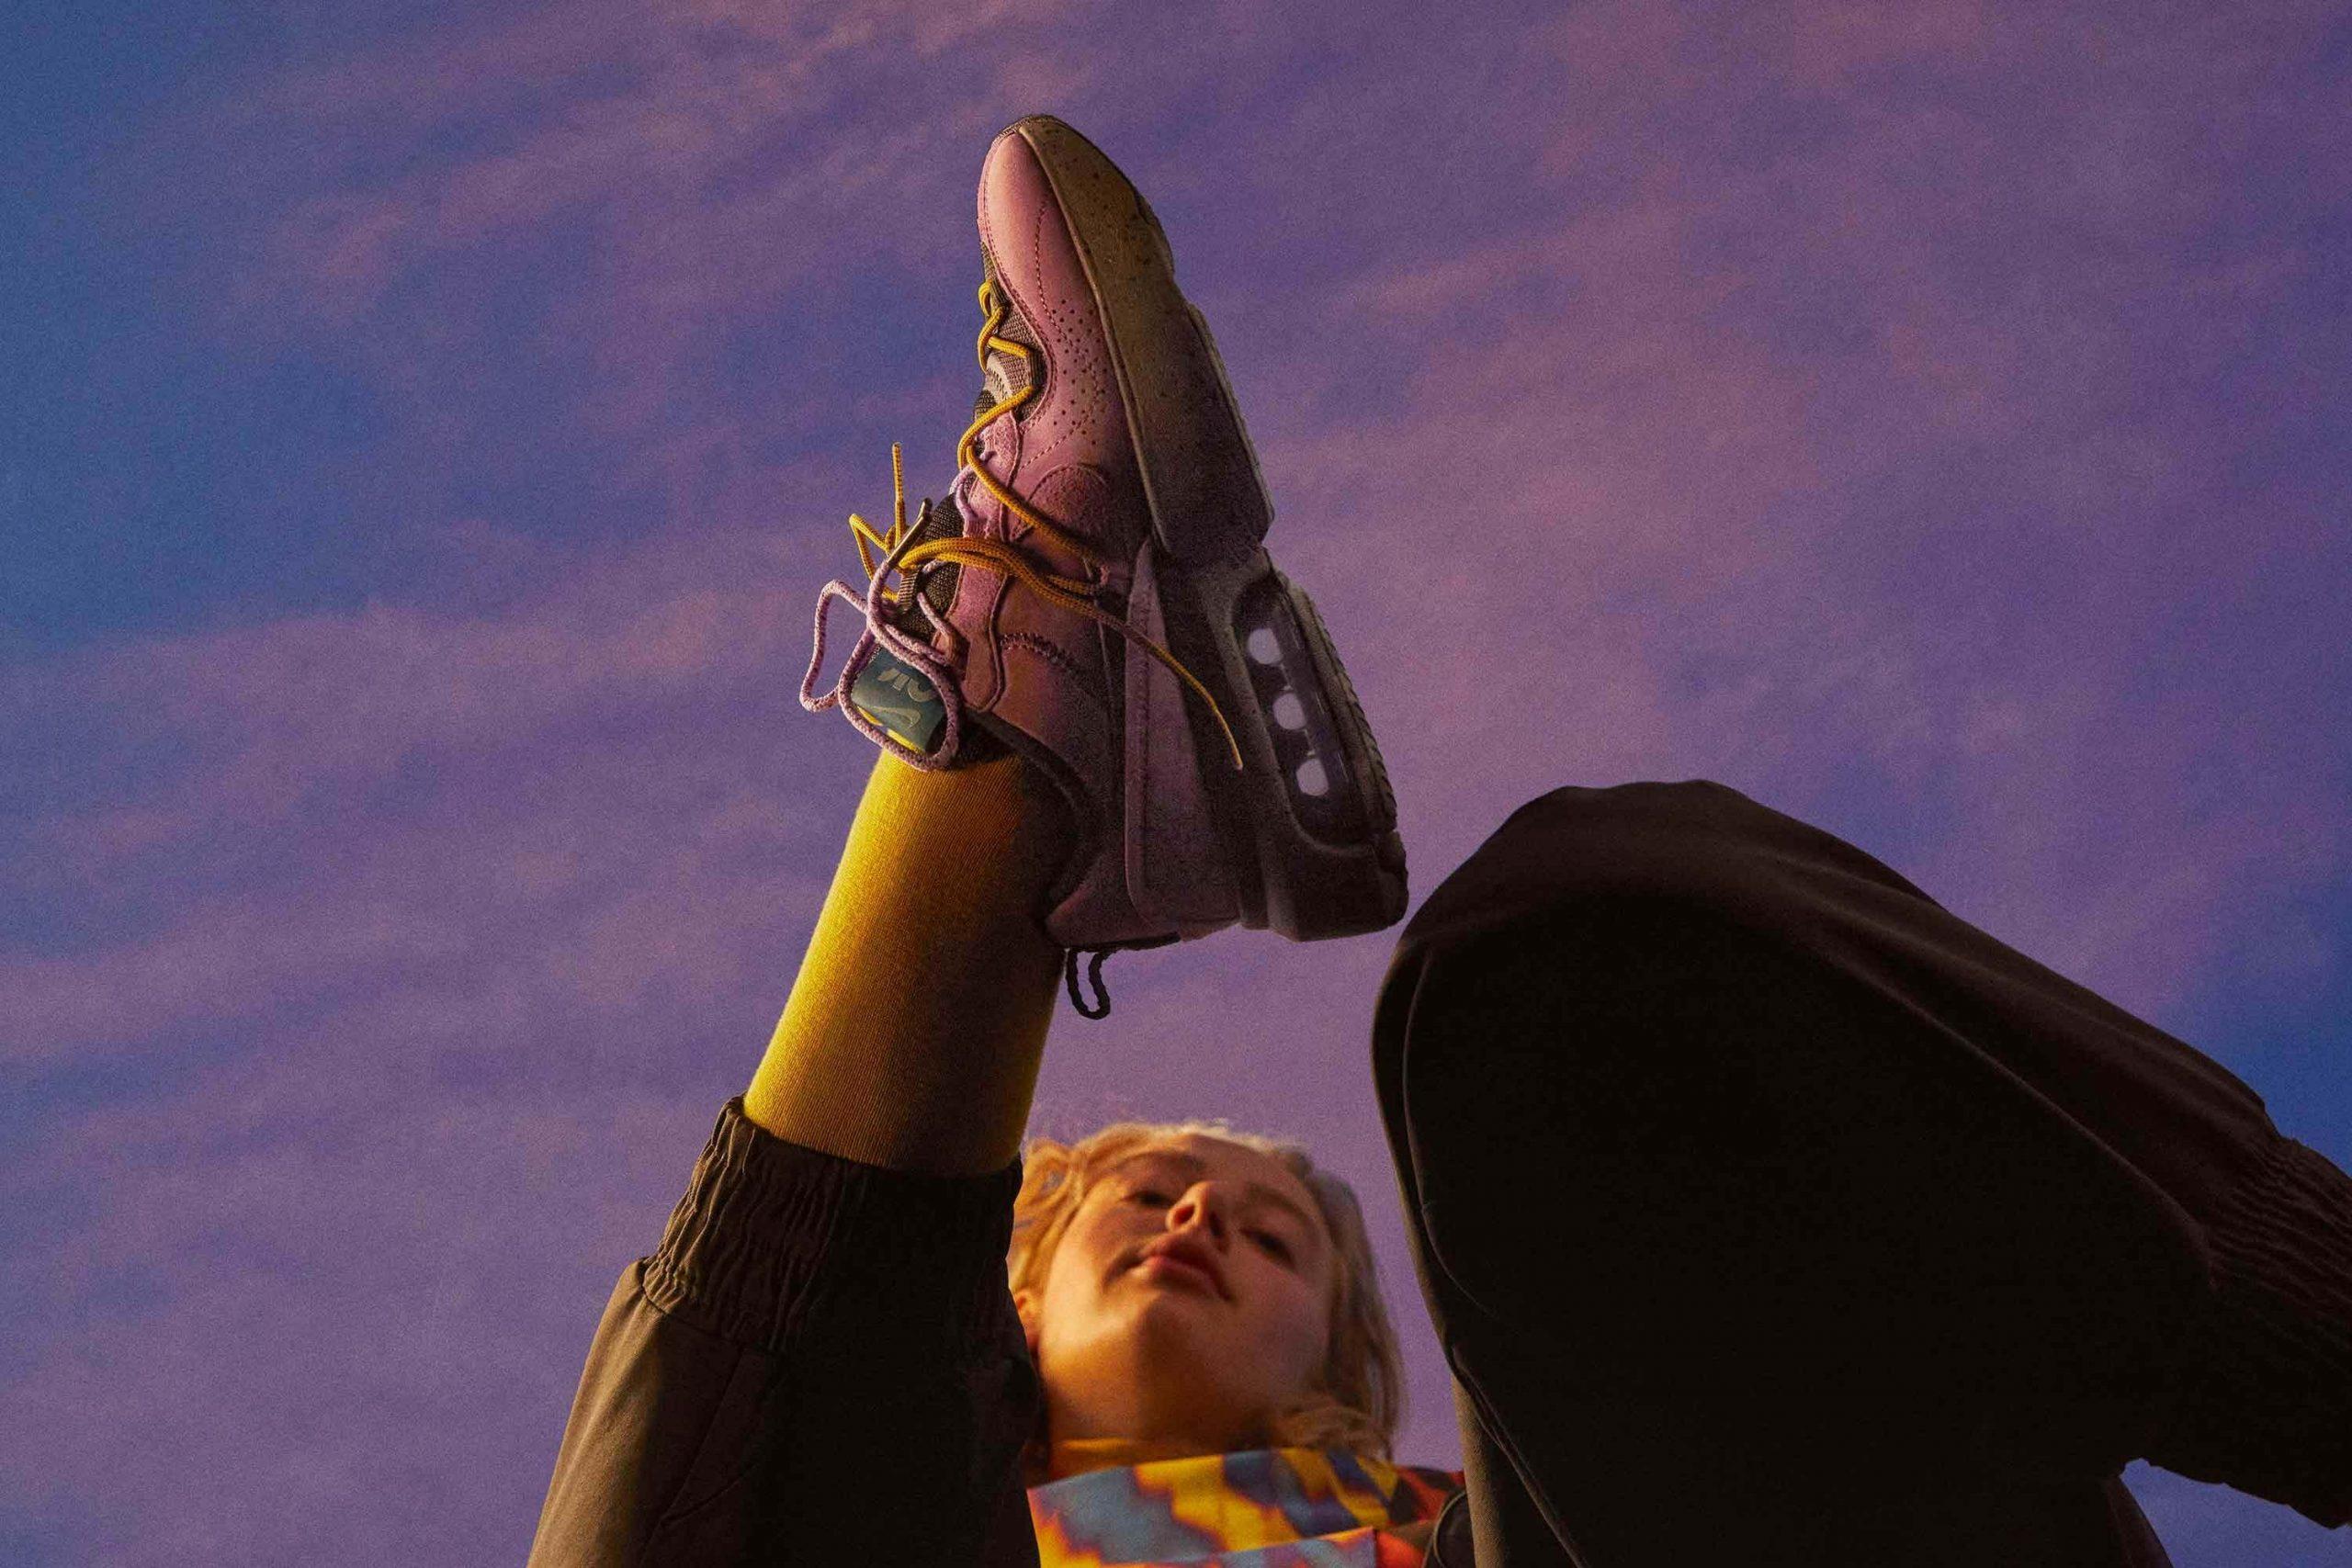 Nike Air Max Spring 2021 Collection Nike-Air-Max-Viva-2